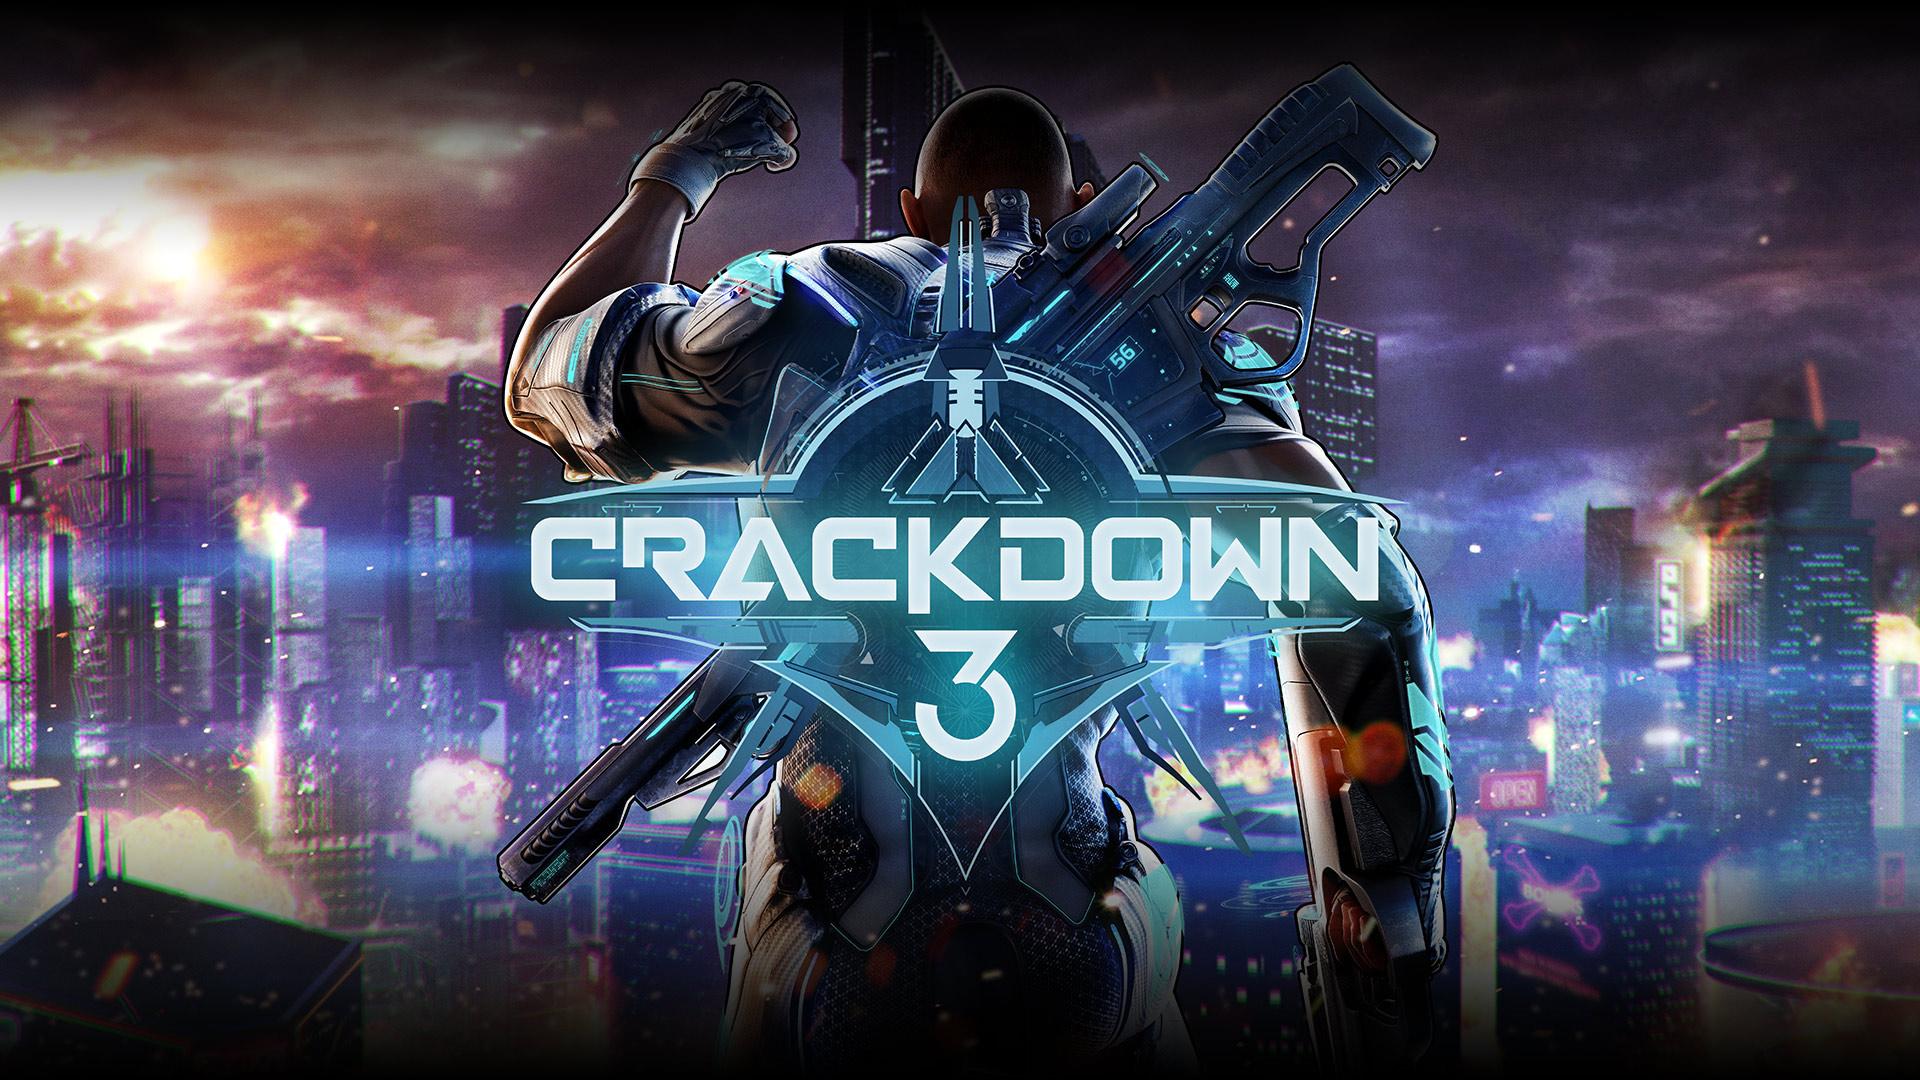 Crackdown III